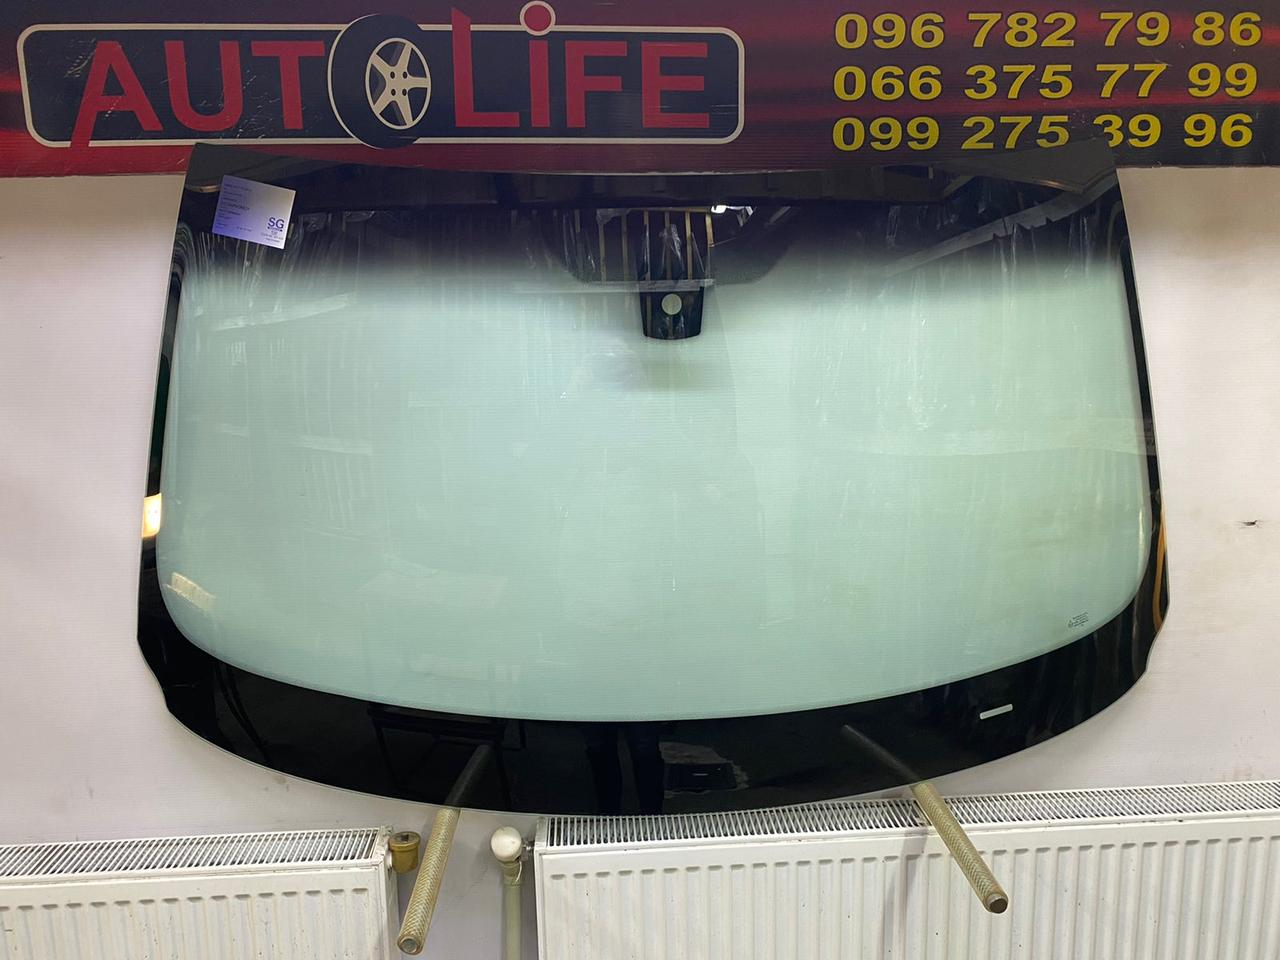 Лобовое стекло BMW X5 F15 2014 - с датчиком дождя | Лобовое стекло БМВ Х5 Ф15 Автоскло -1939 грн. Доставка